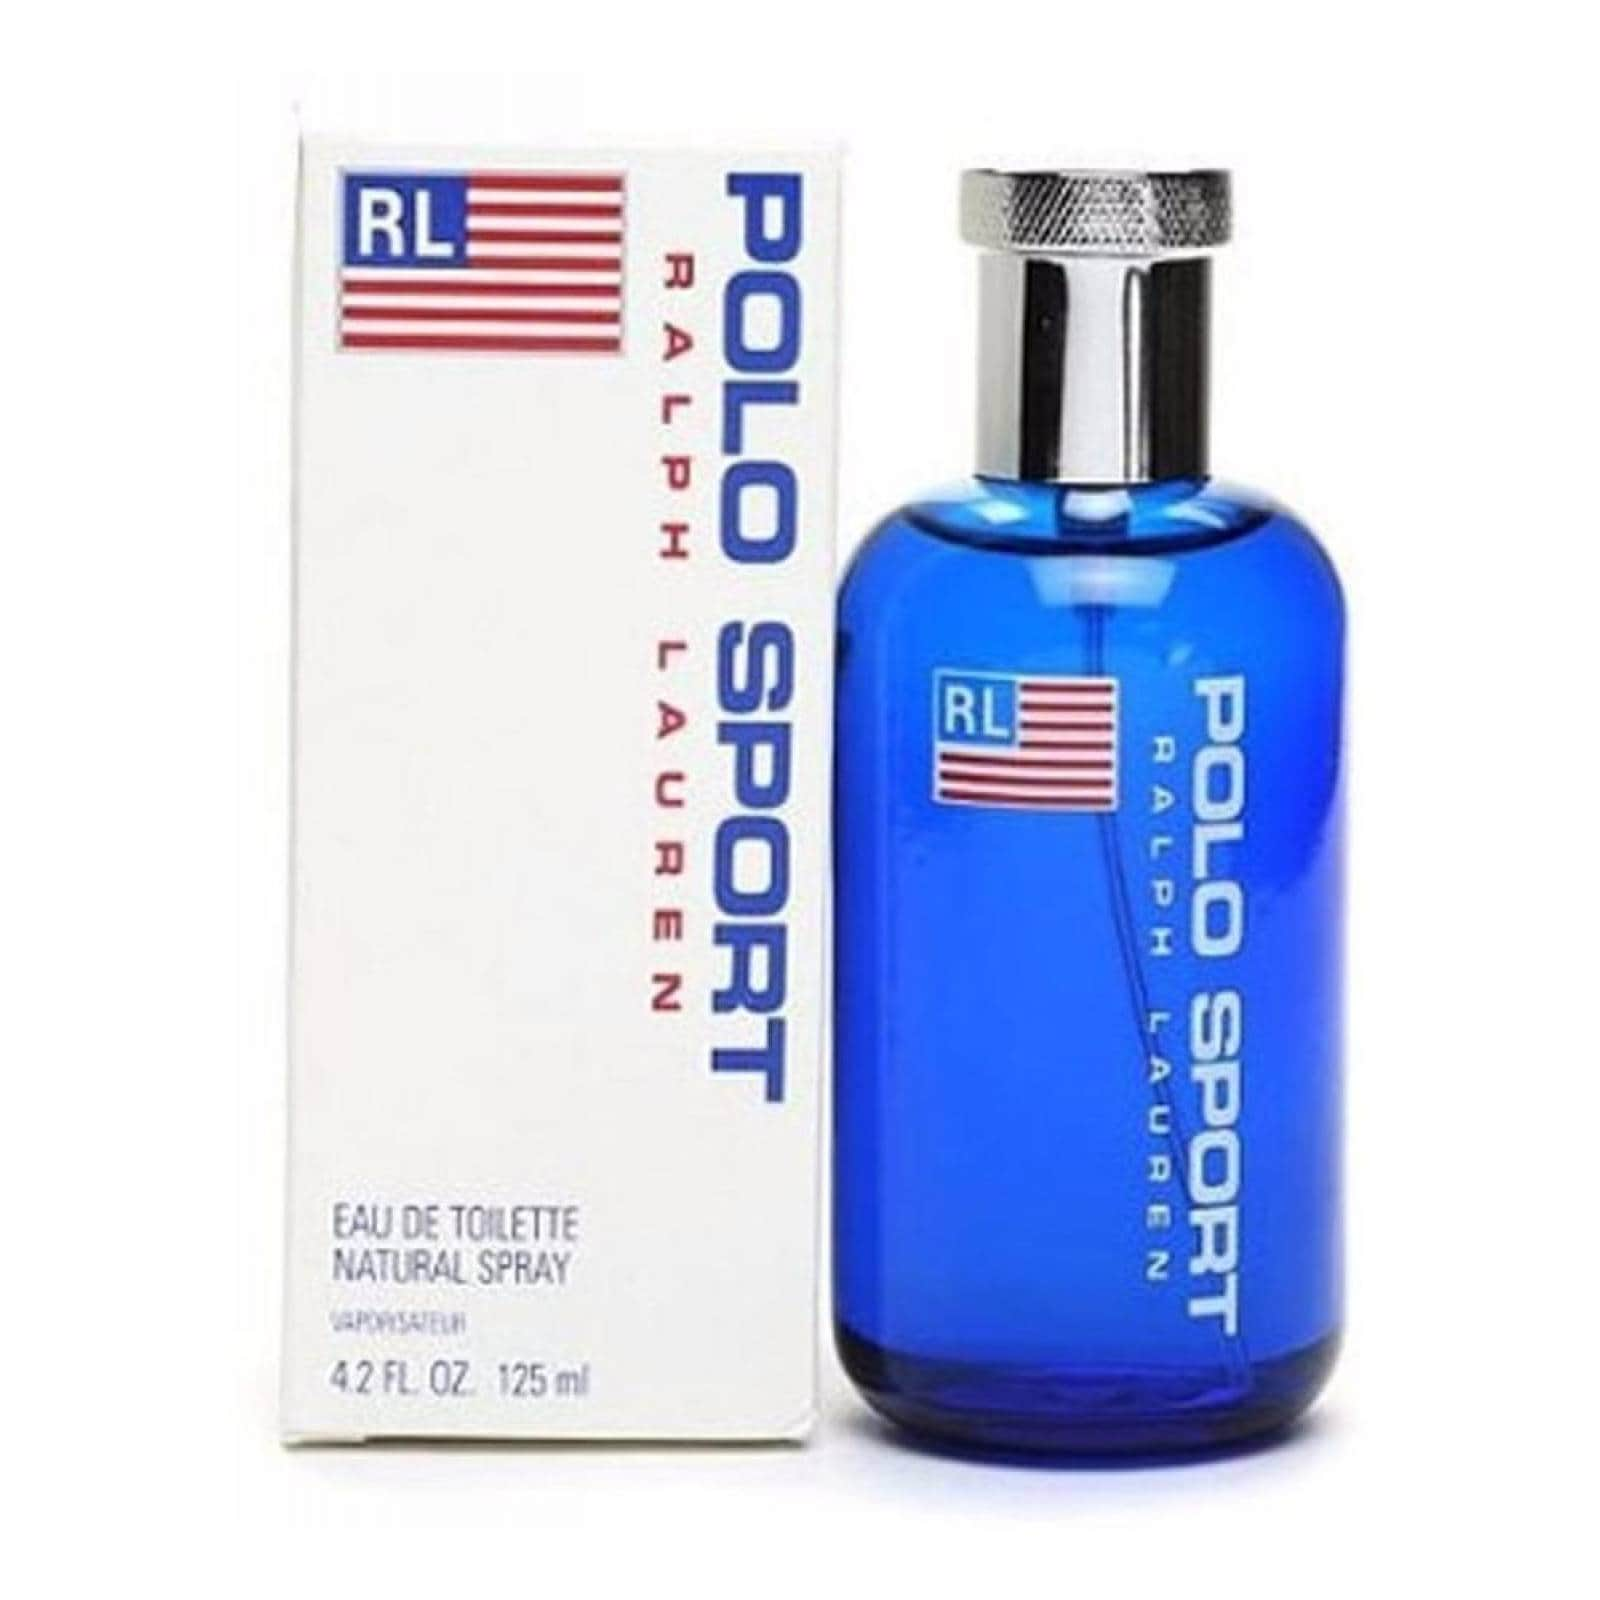 Polo Sport de Ralph Lauren Caballero de 125 ml